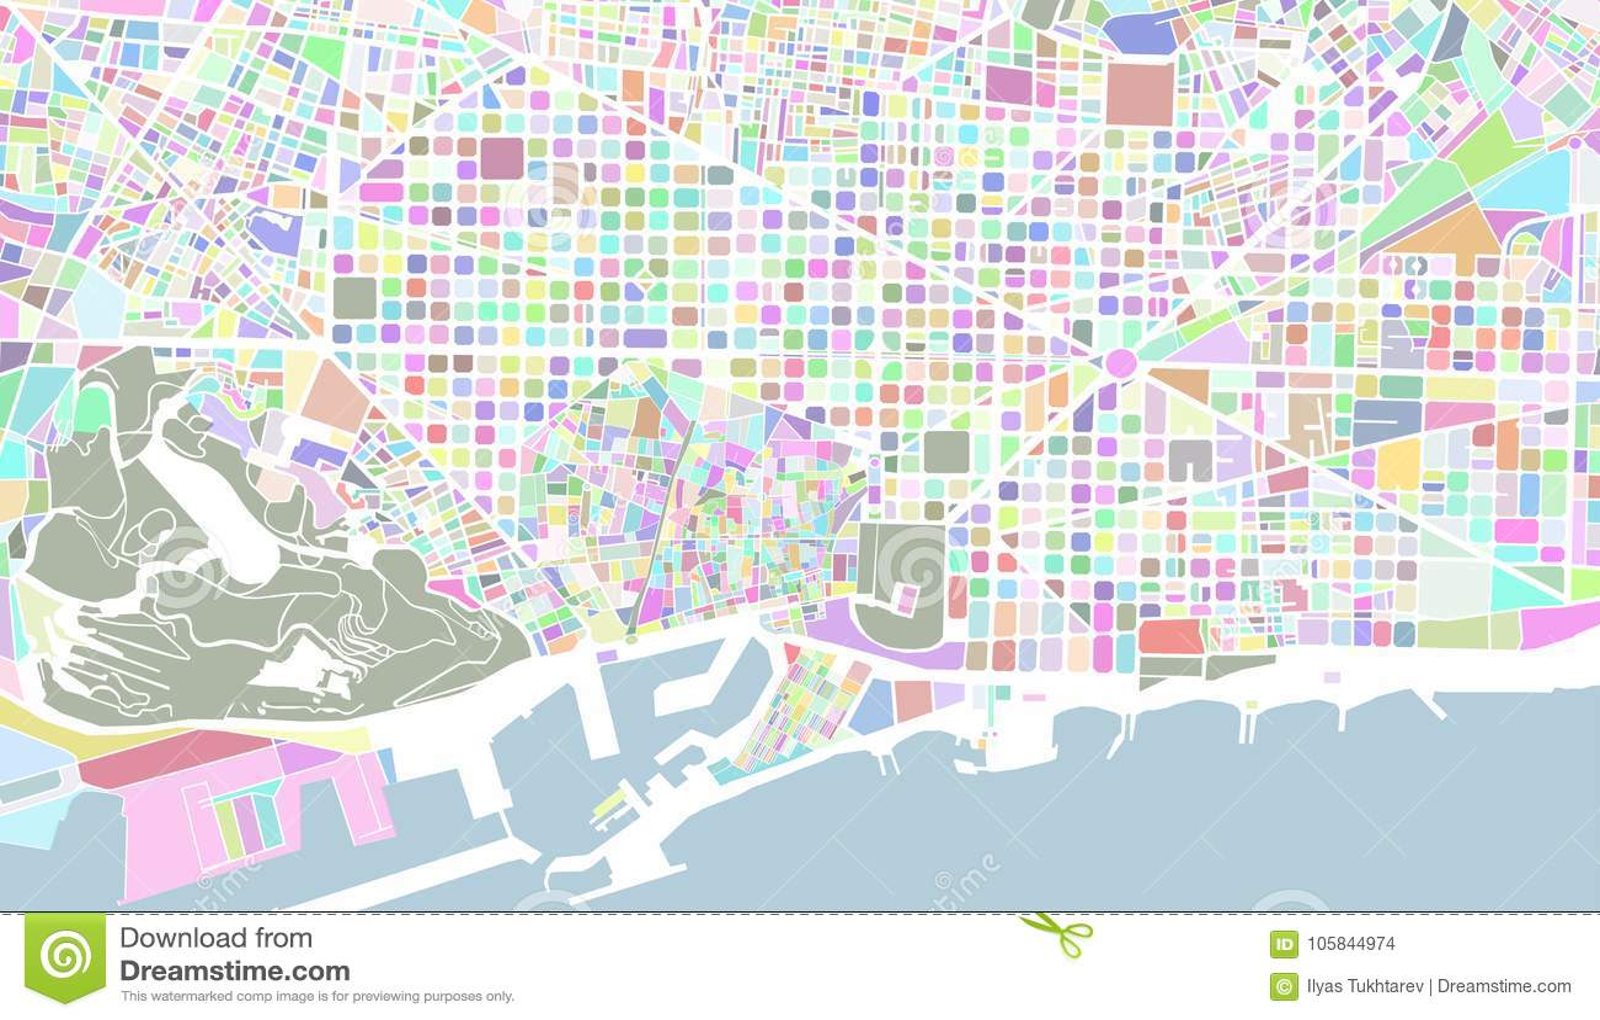 Mapa De La Ciudad De Barcelona Espana Stock De Ilustracion